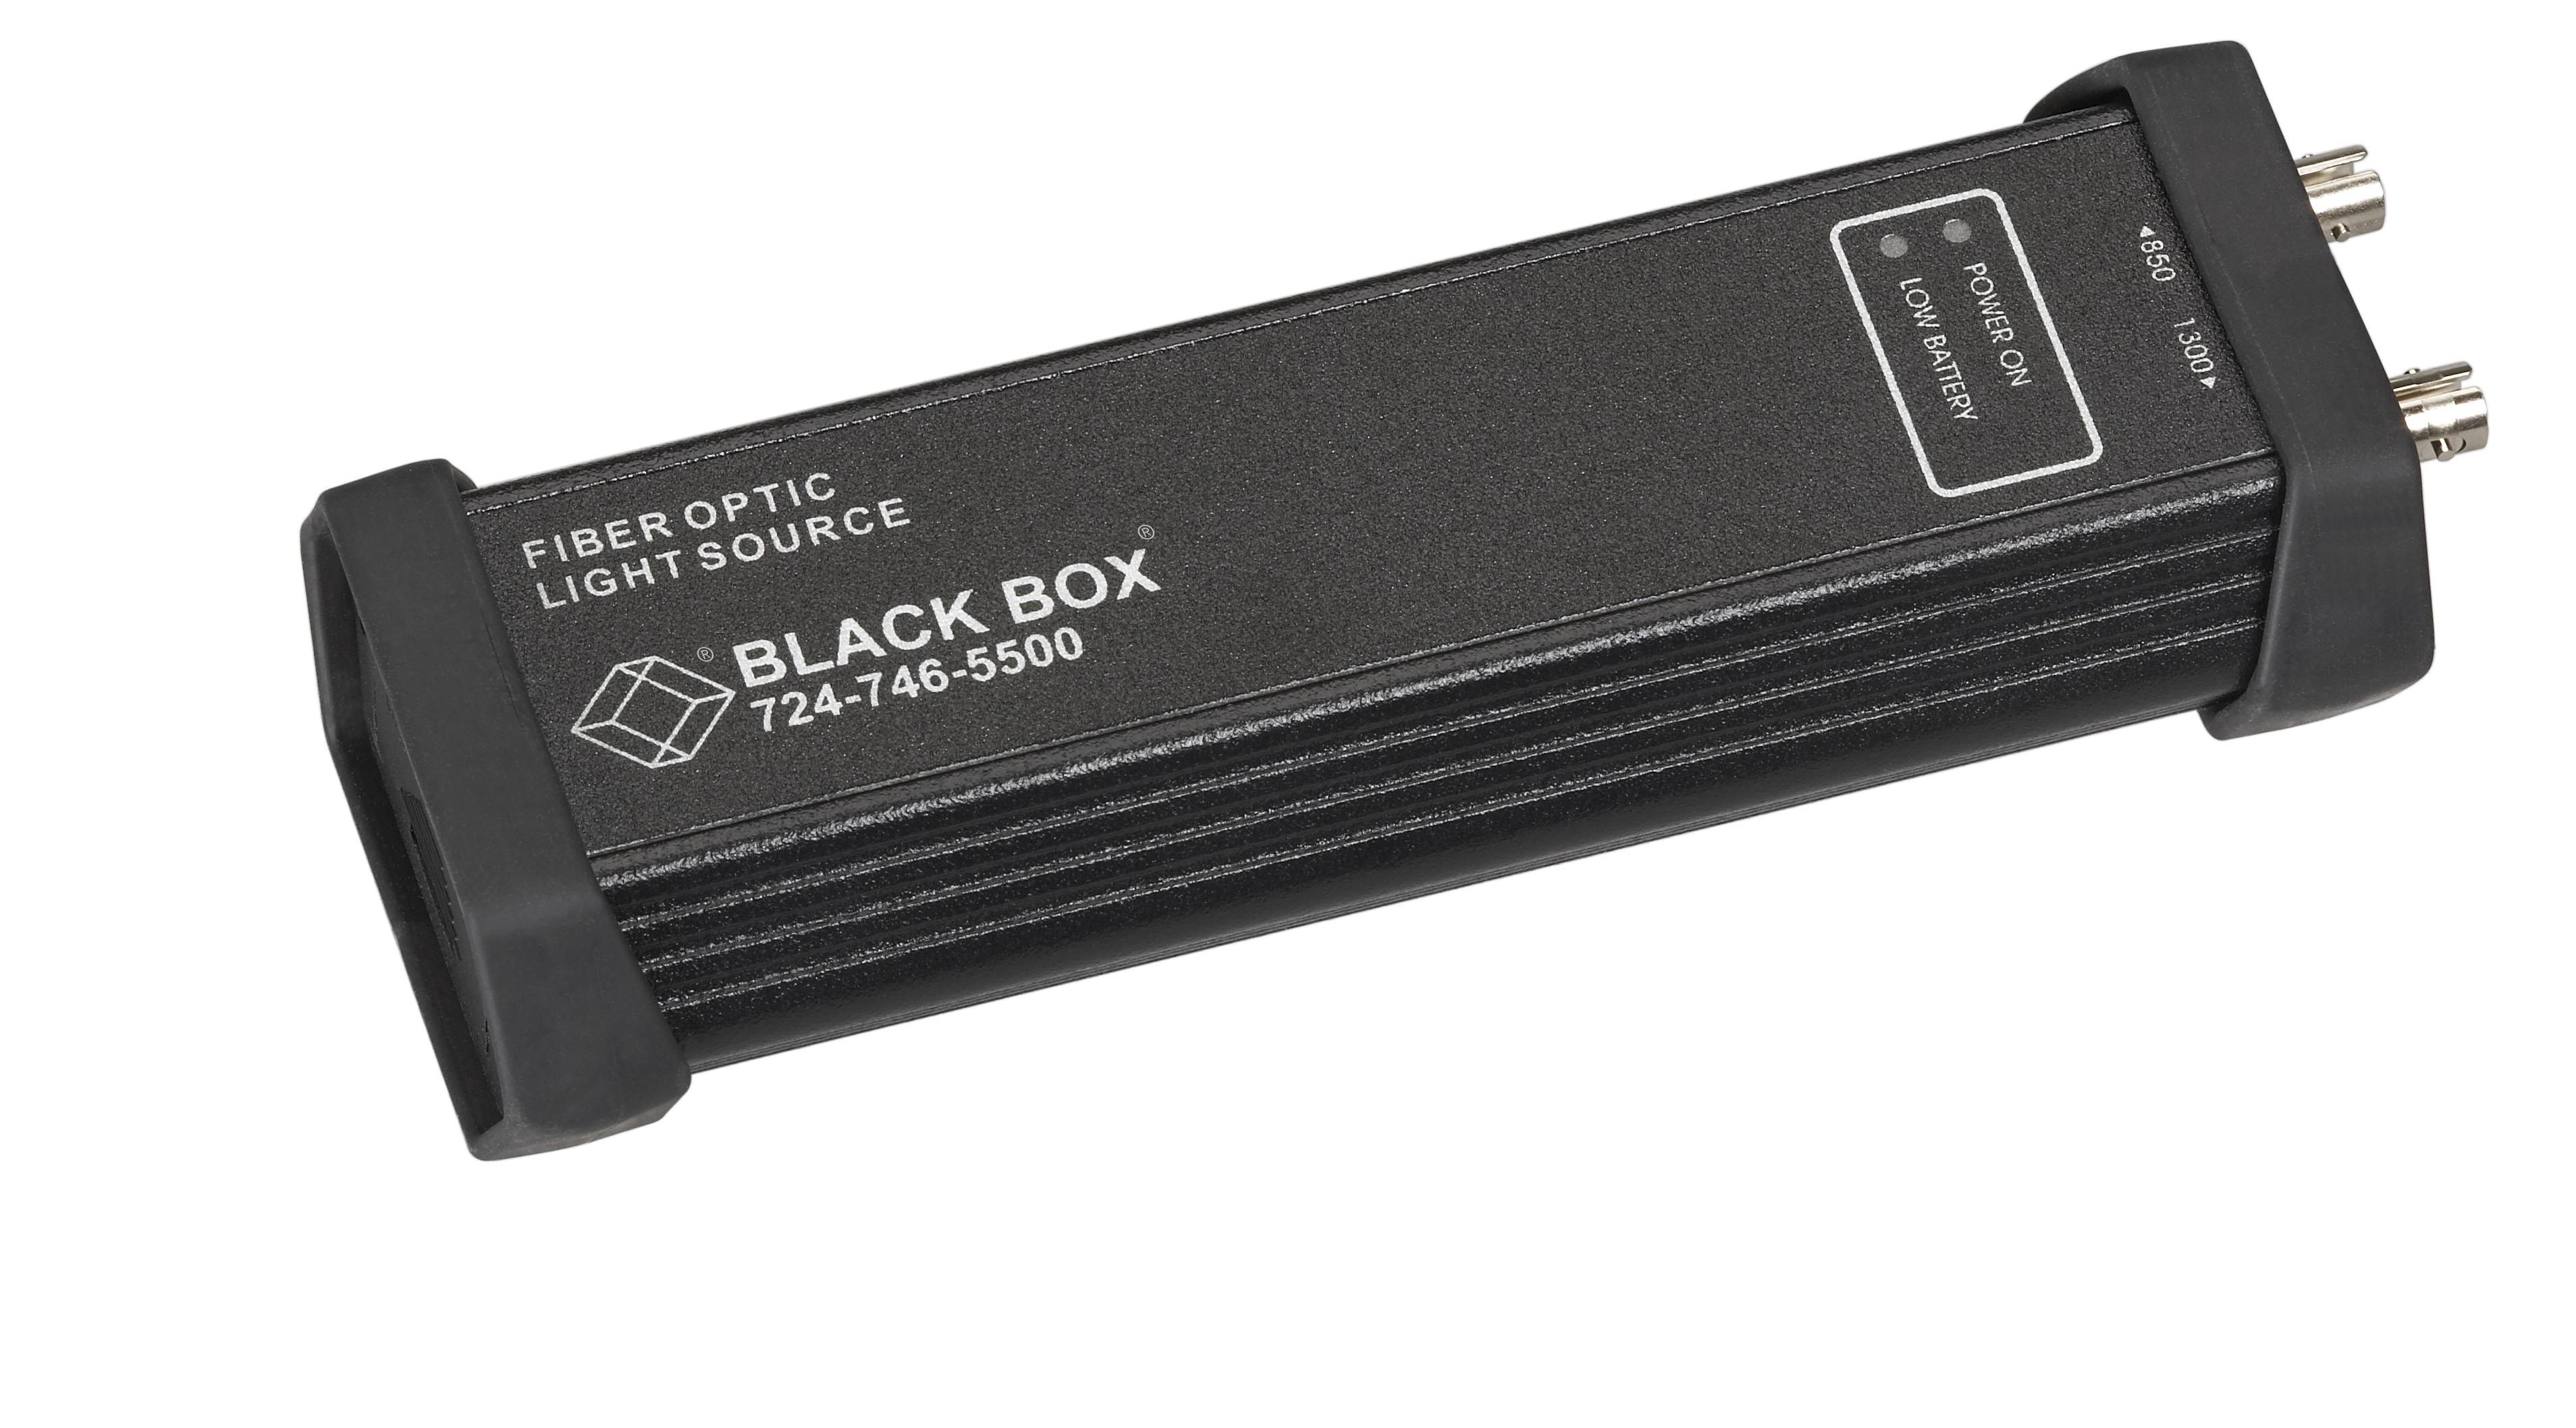 Fiber Laser St Light Source Black Box Application Note Visiblelaser Driver Has Digitally Controlled Power Ts510a R2